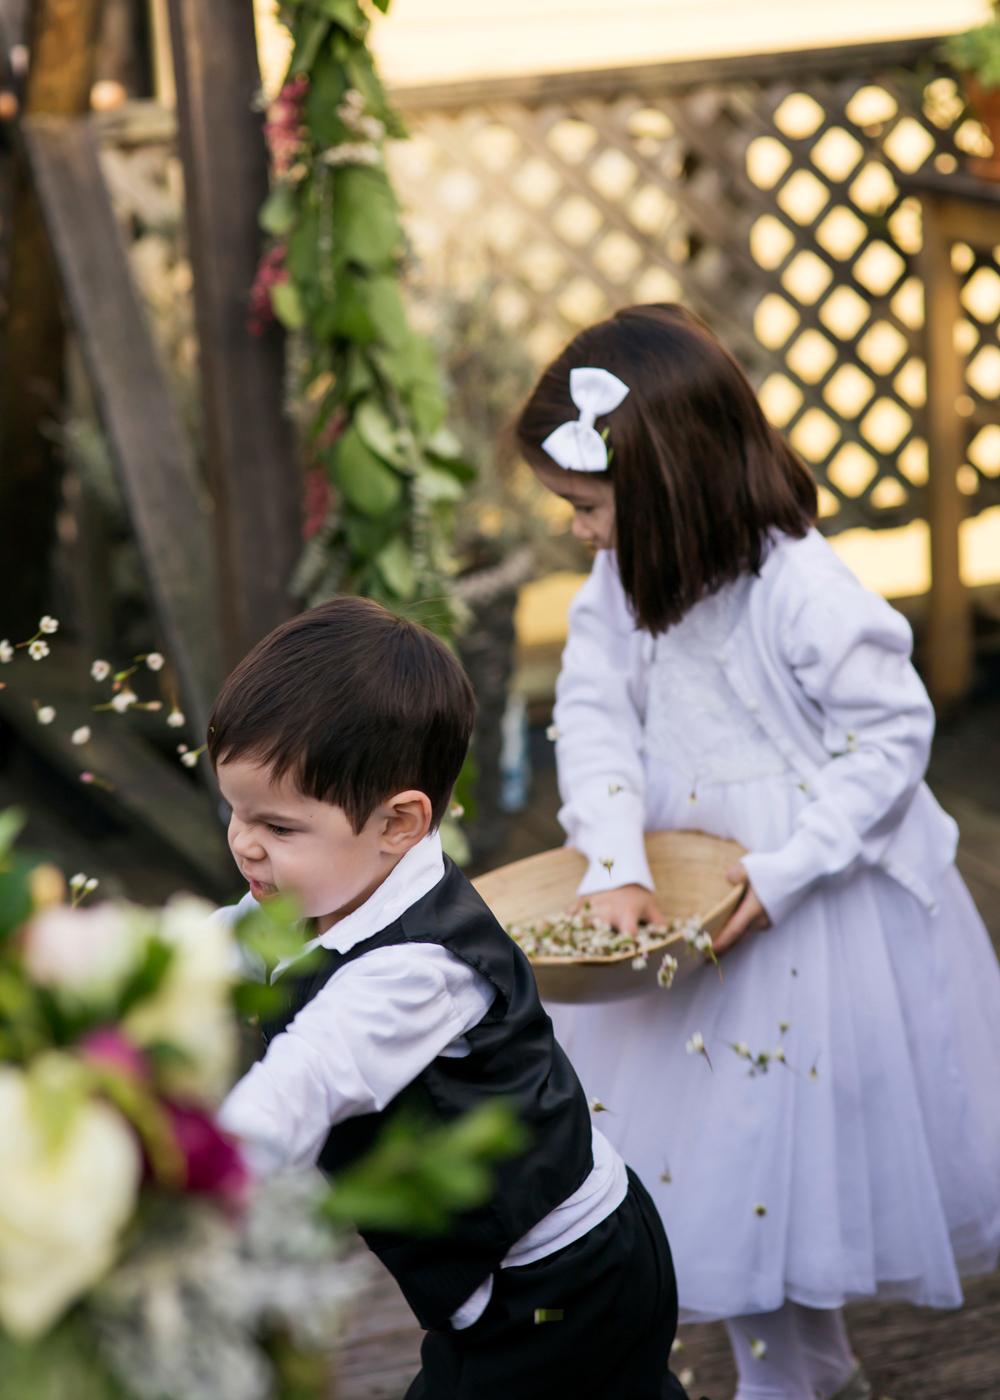 presidio-wedding-photography-lilouette-063.jpg